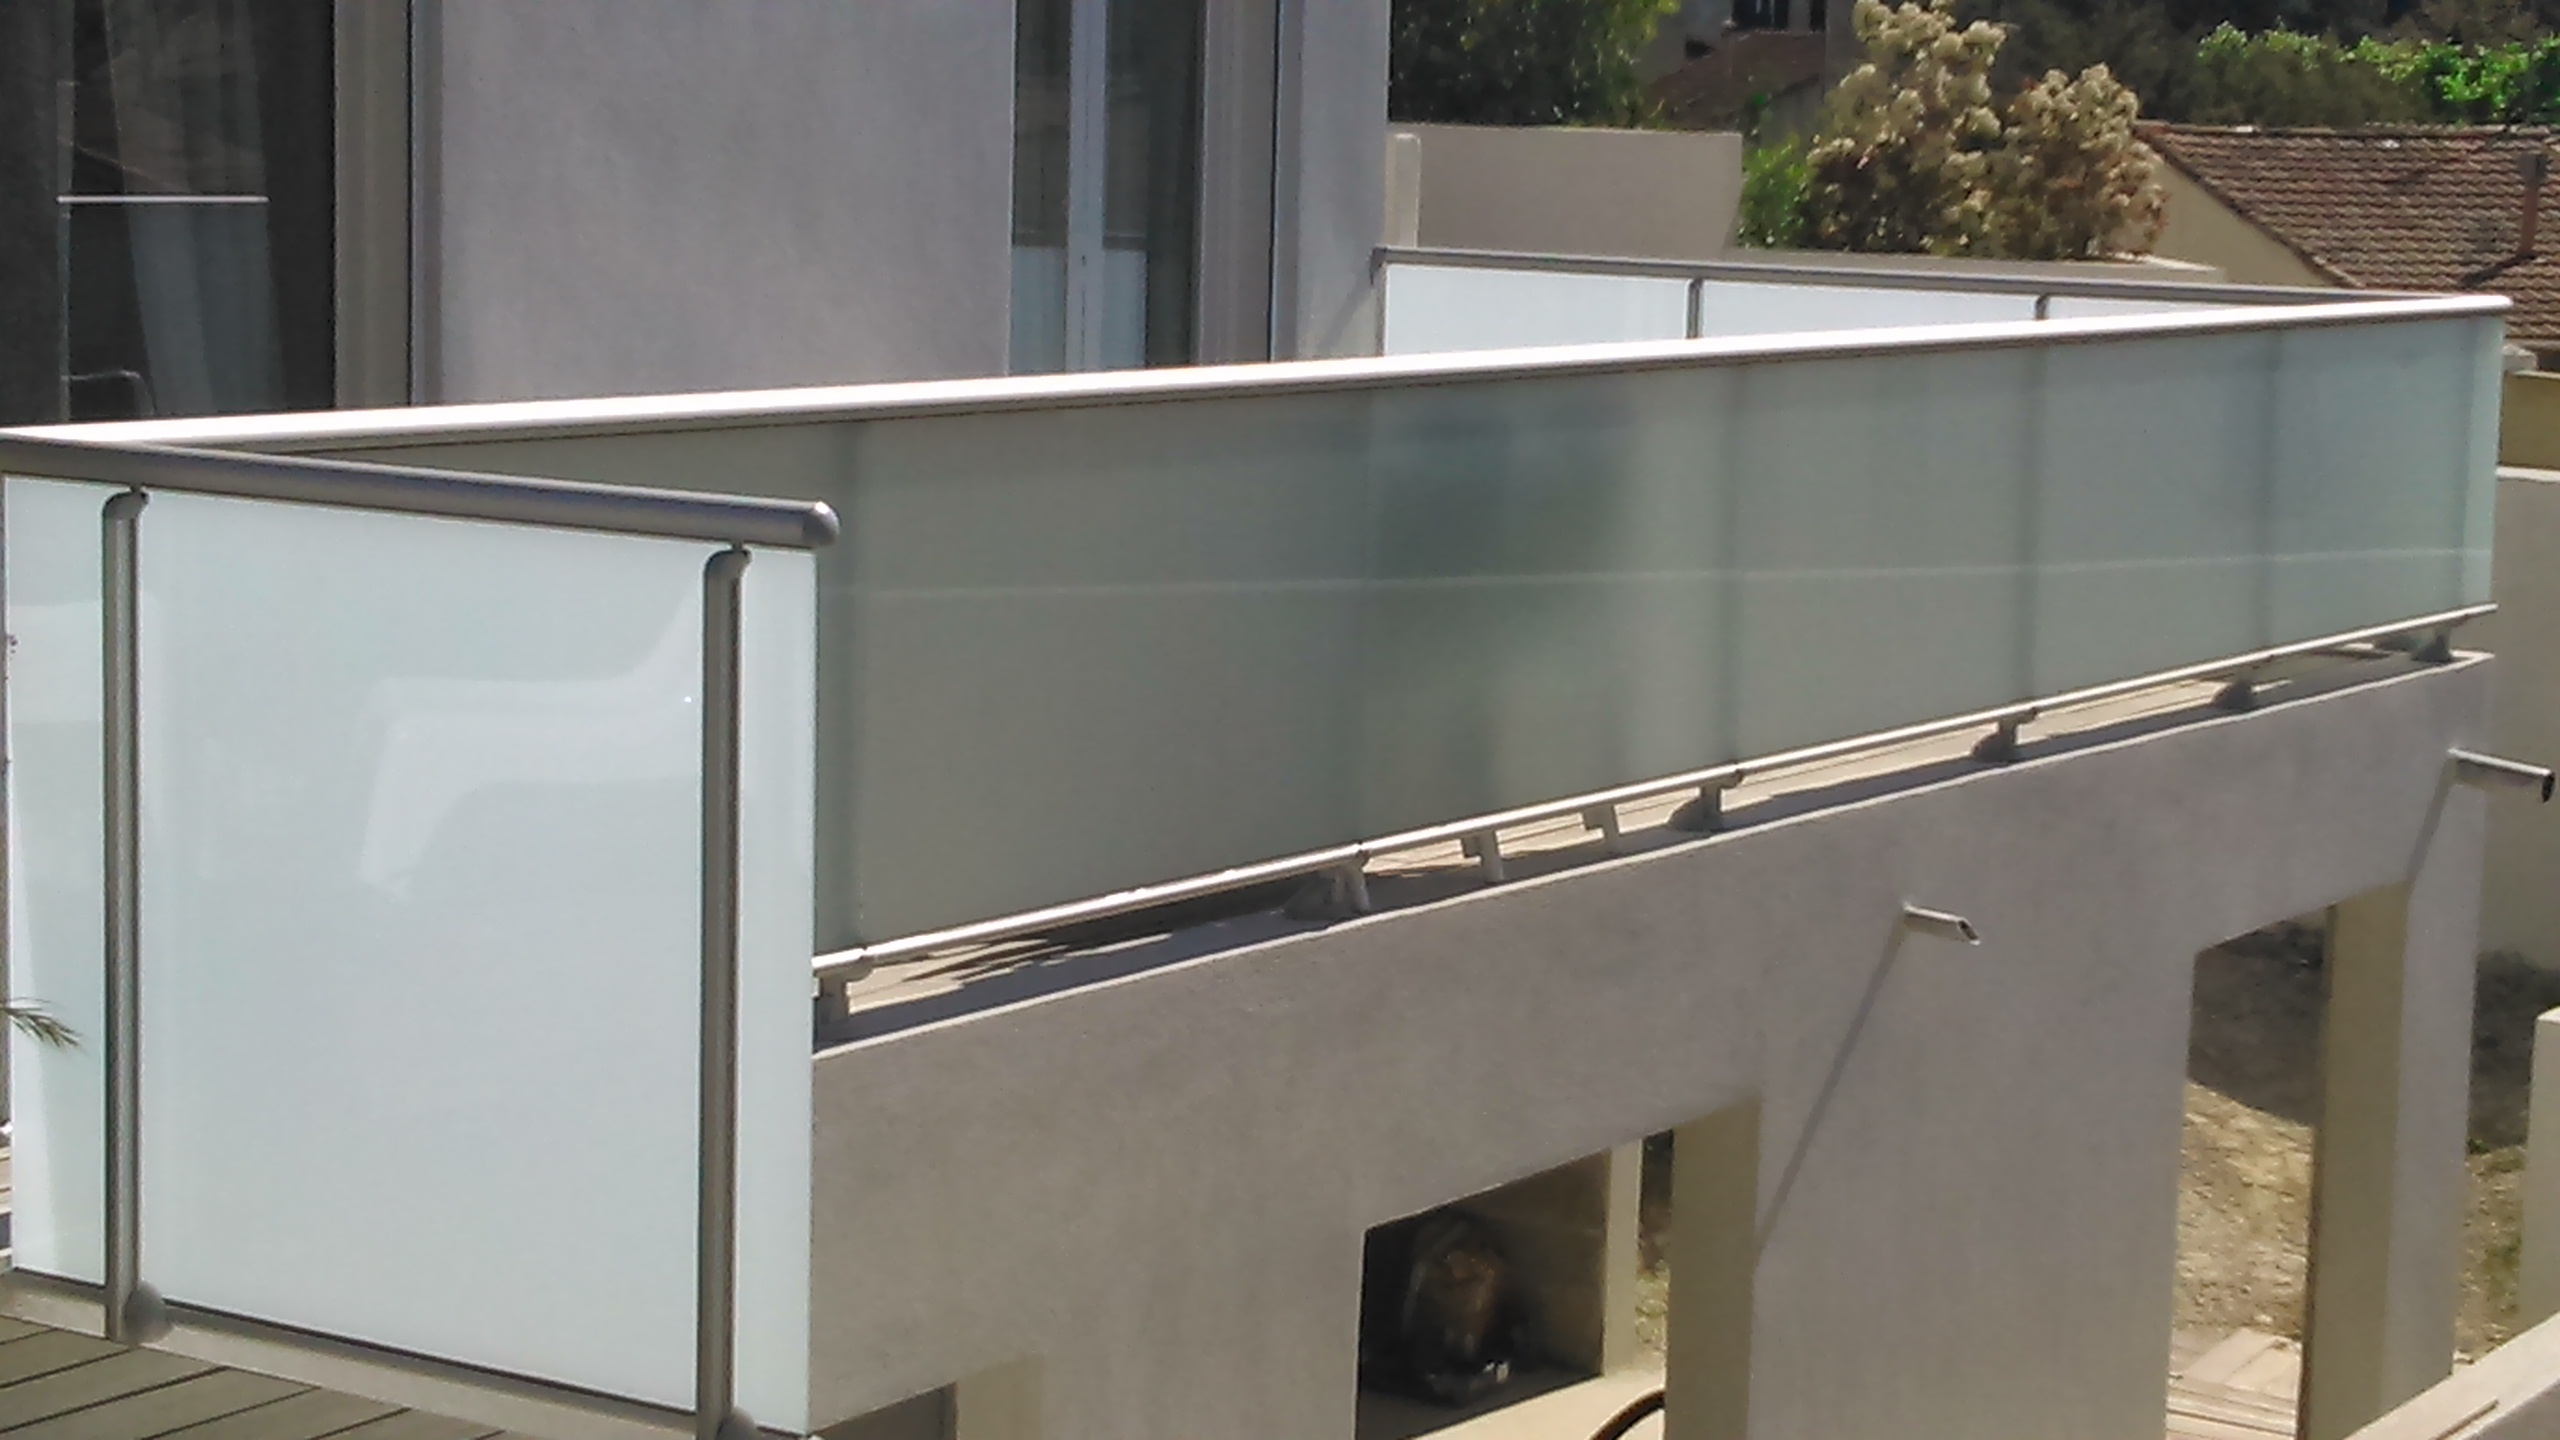 garde corps aluminium vitr sous main courante marseille. Black Bedroom Furniture Sets. Home Design Ideas